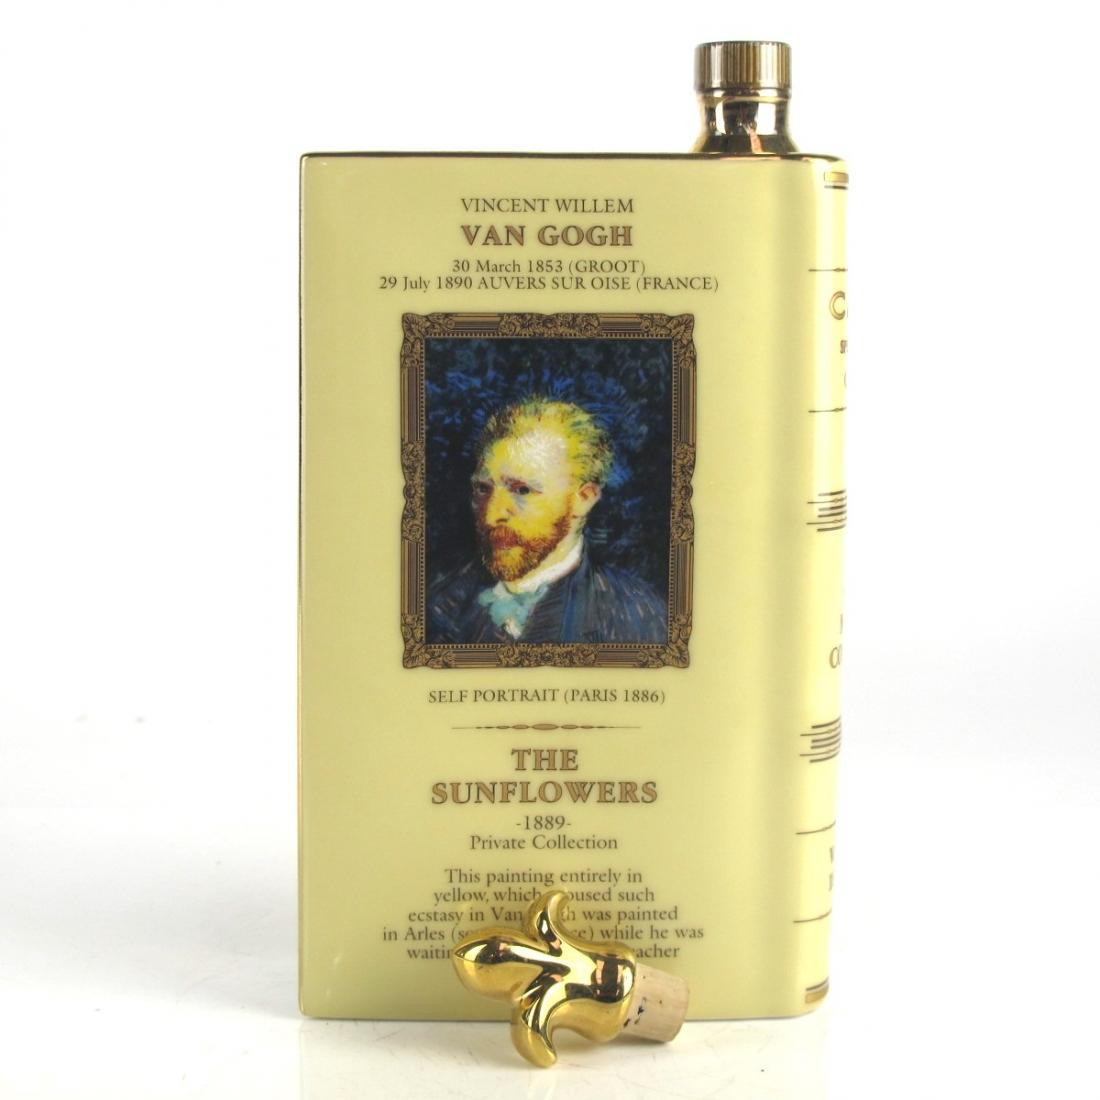 Camus Cognac Special Reserve / Van Gogh Sunflowers Decanter